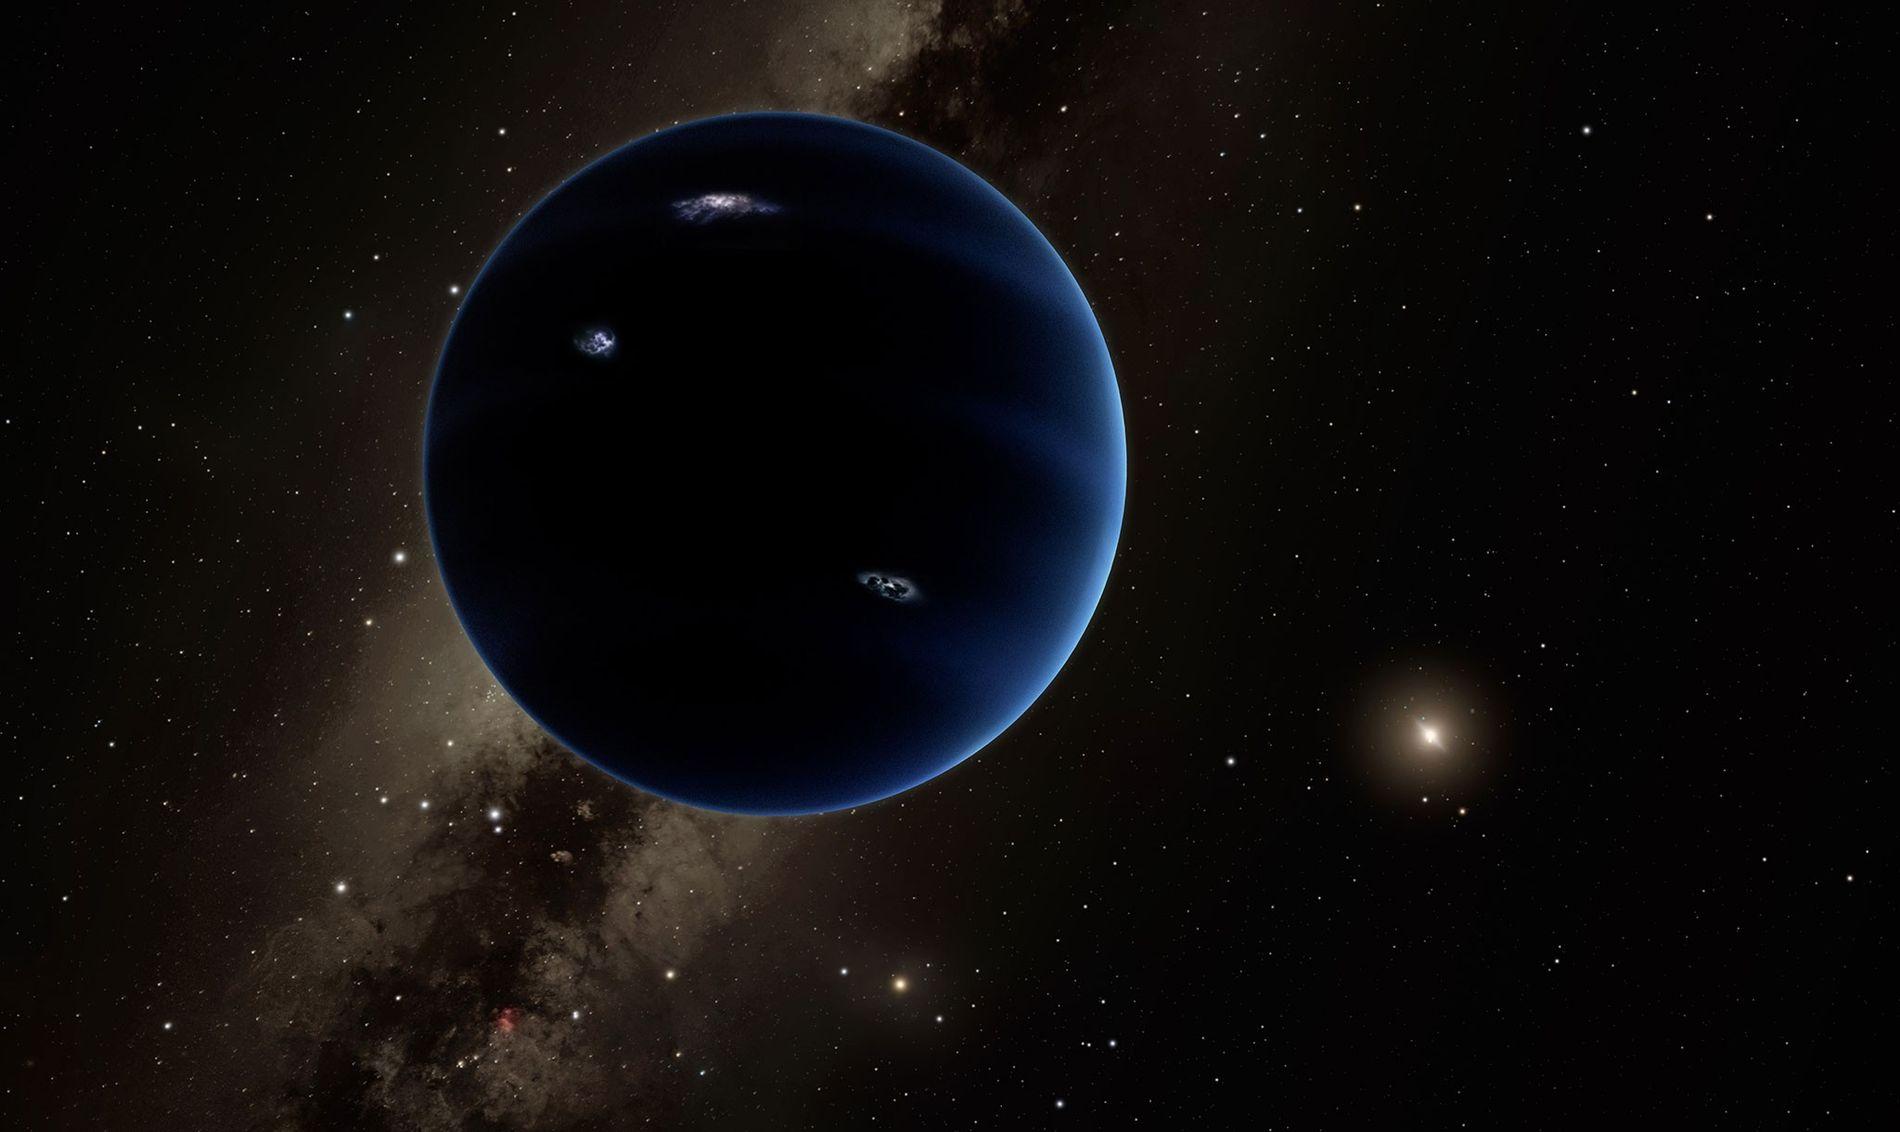 planeta_nueve1